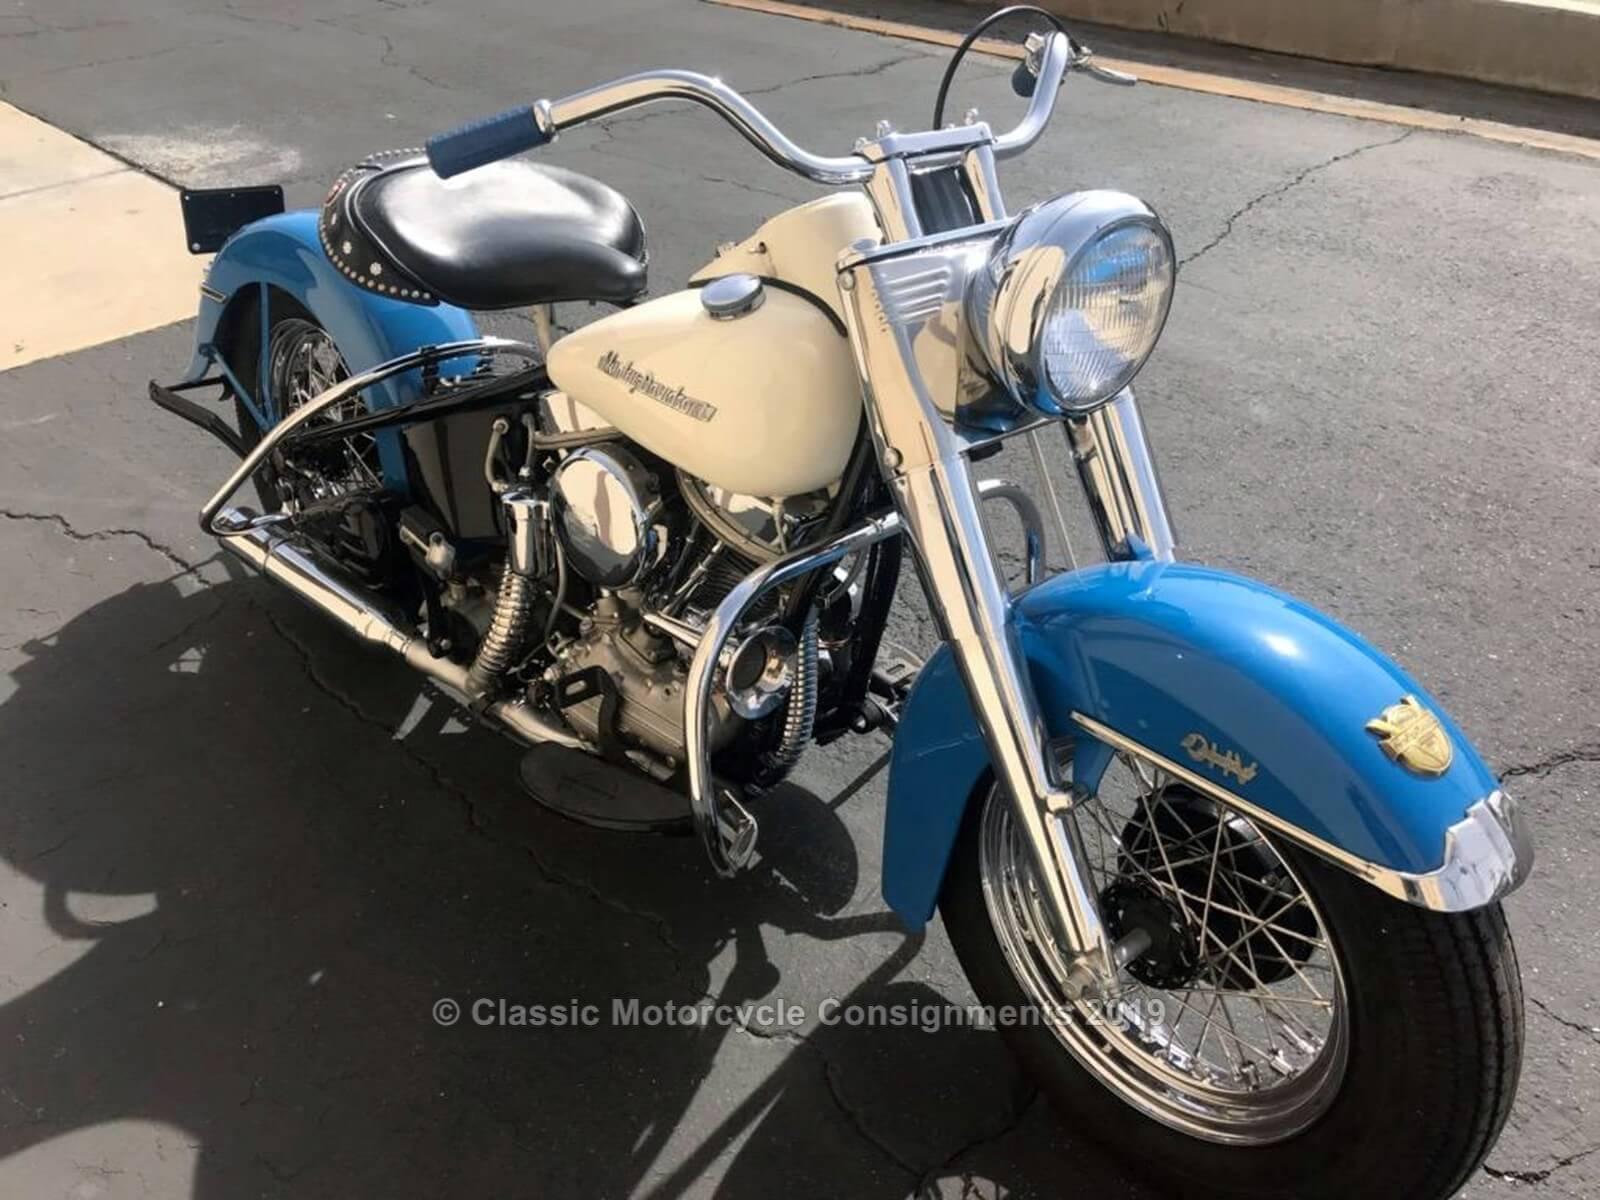 1954 Harley Davidson FLE – 50th Anniversary Model